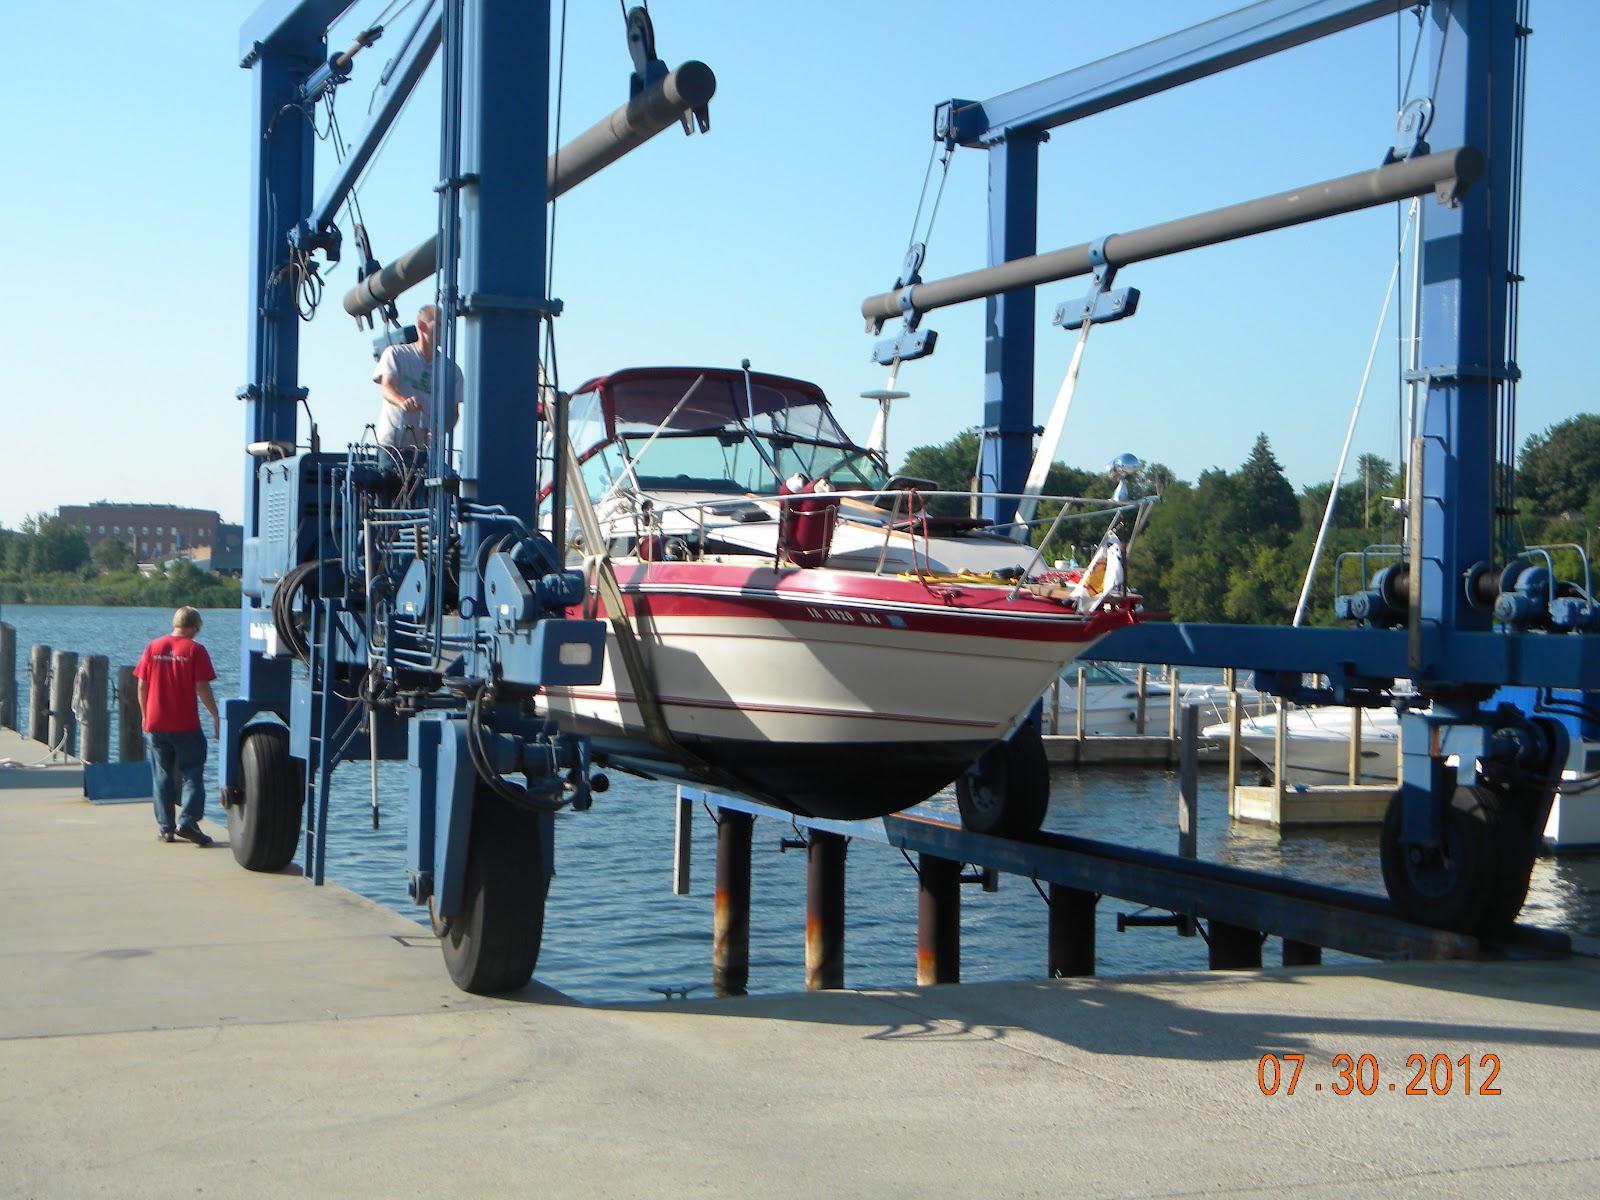 Miss TeRae: Boat Repair Week - spent in South Haven